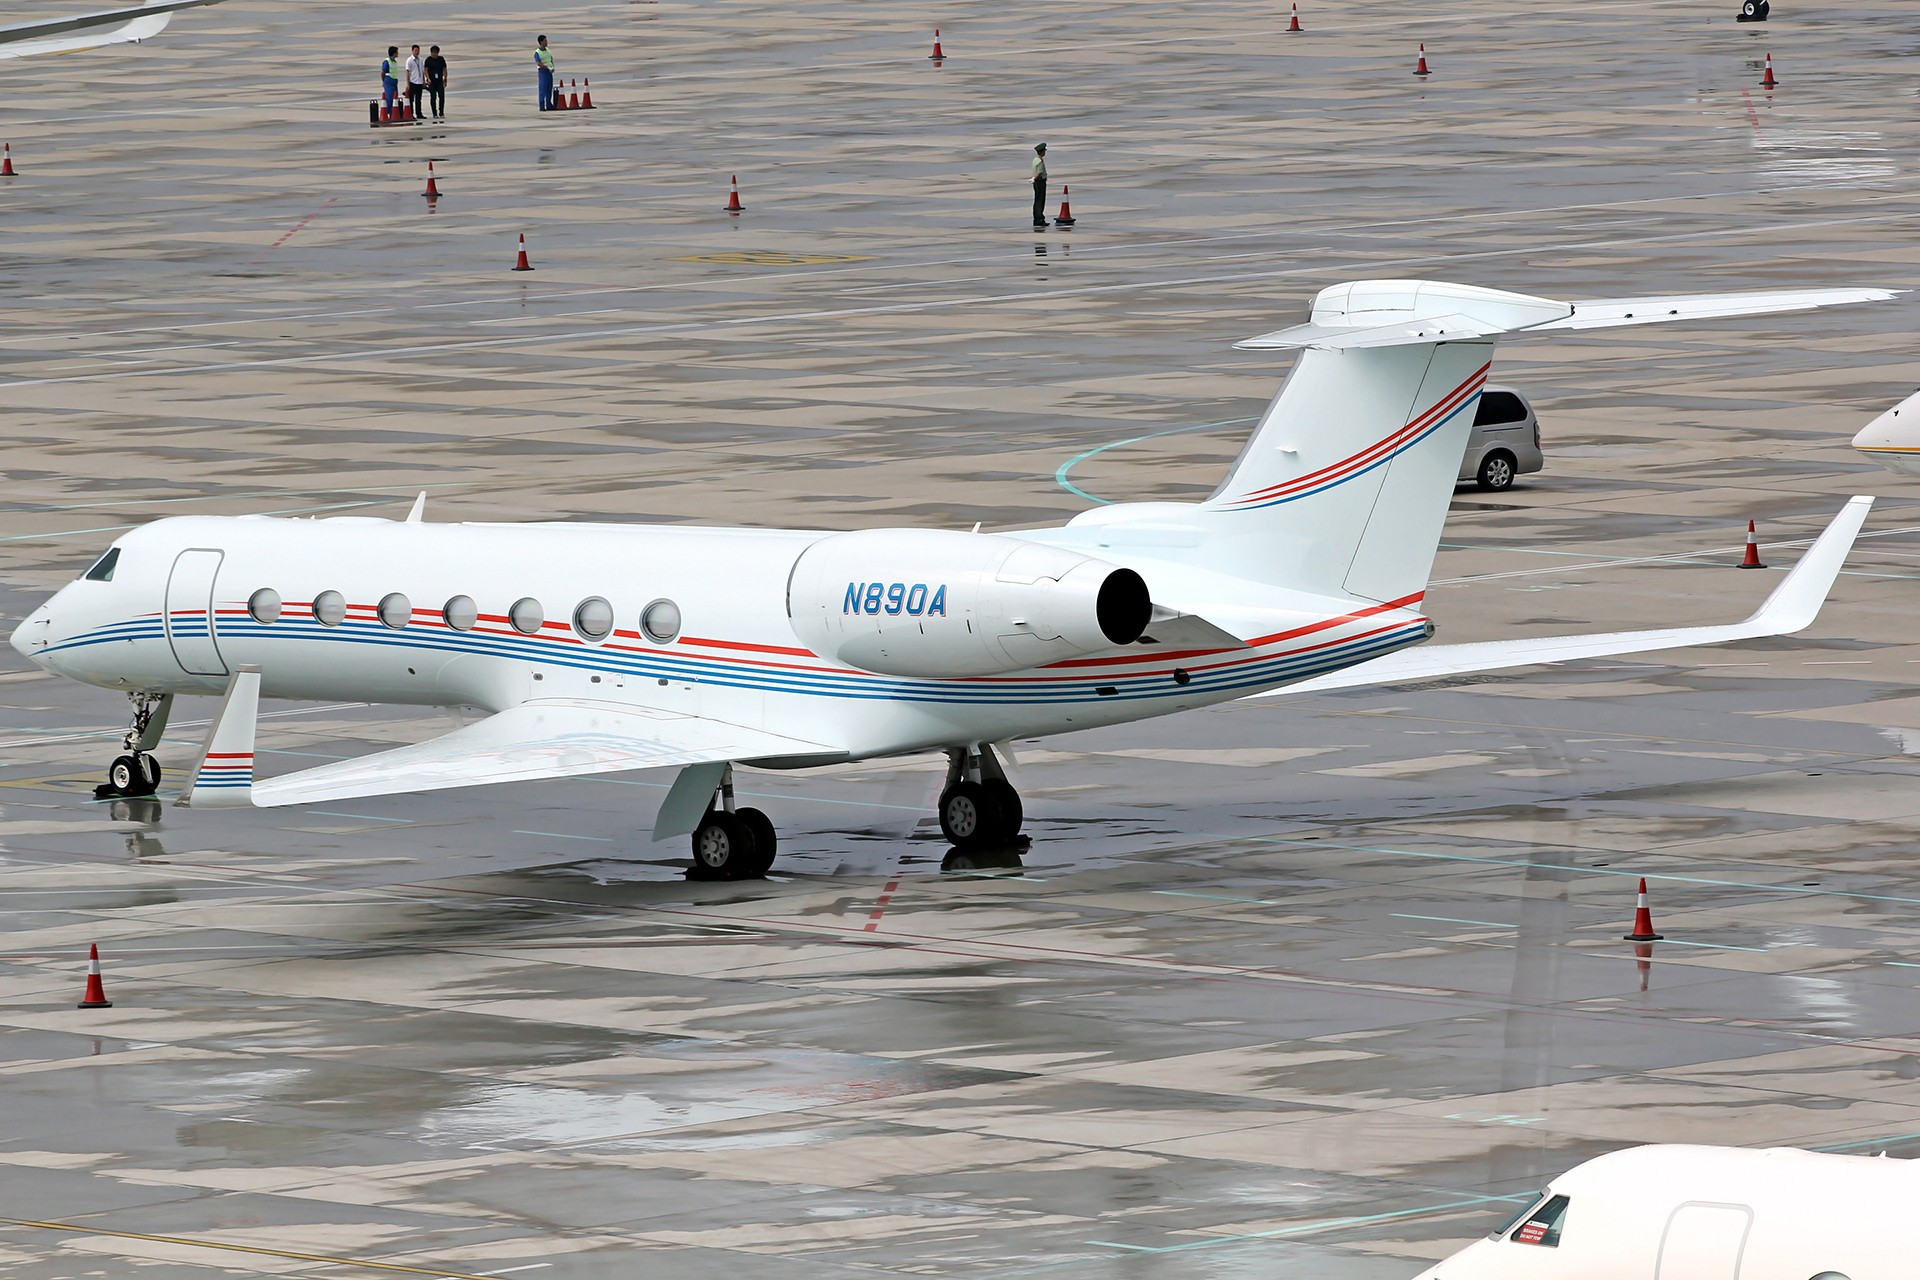 Re:[原创][DLC]。。。达沃斯公务机。。。 GULFSTREAM G550 N890A 中国大连国际机场